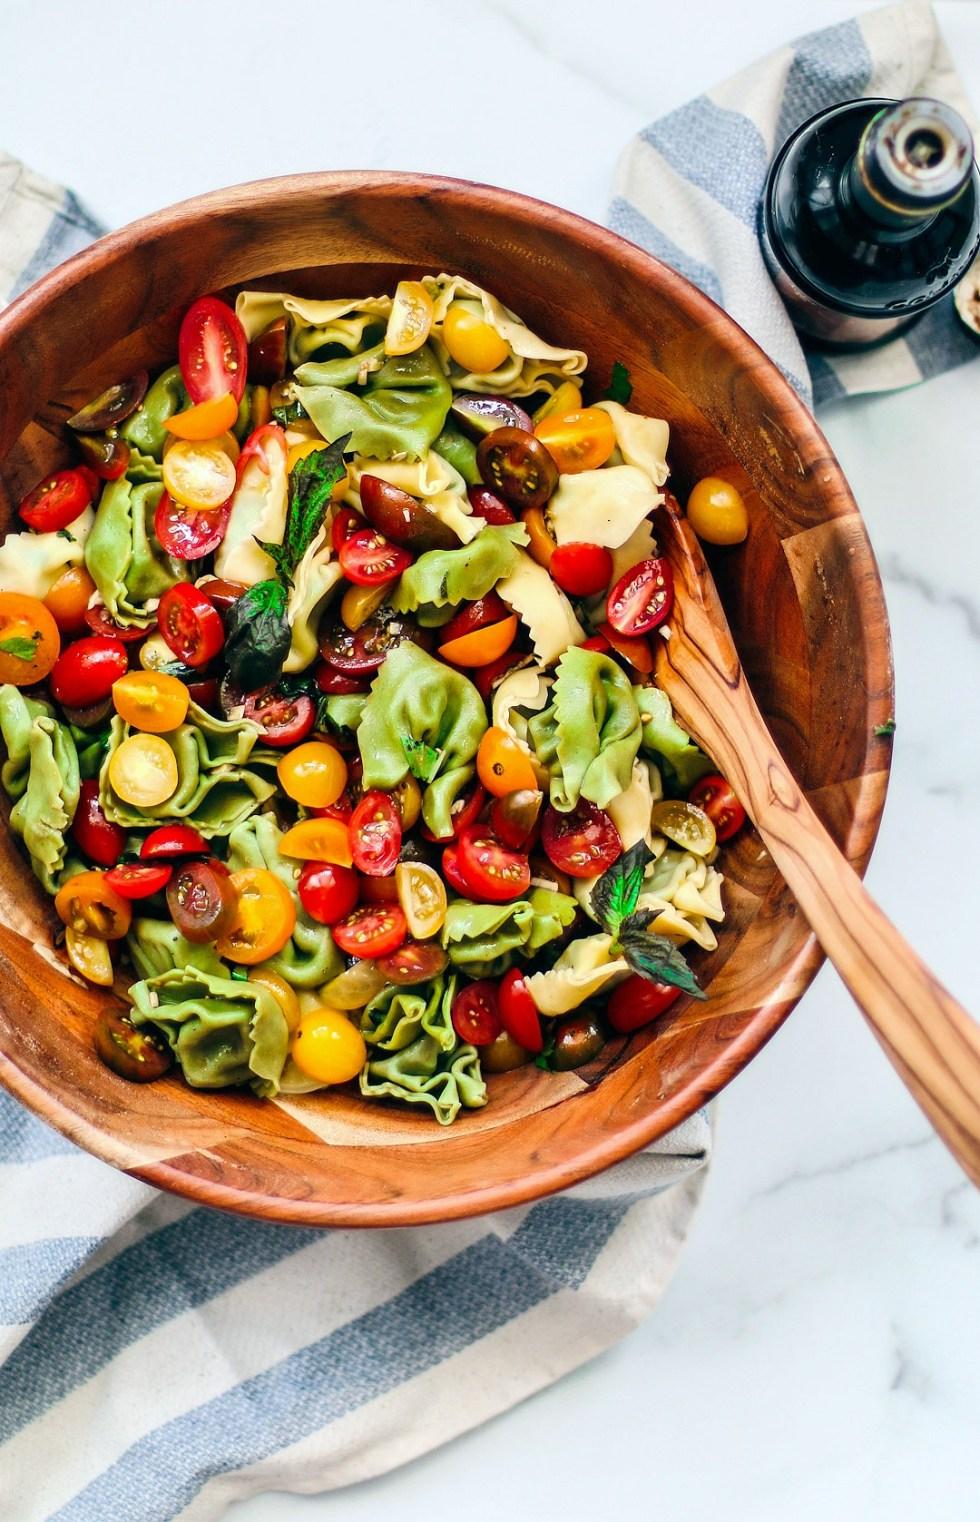 Big bowl of tortellini pasta salad.